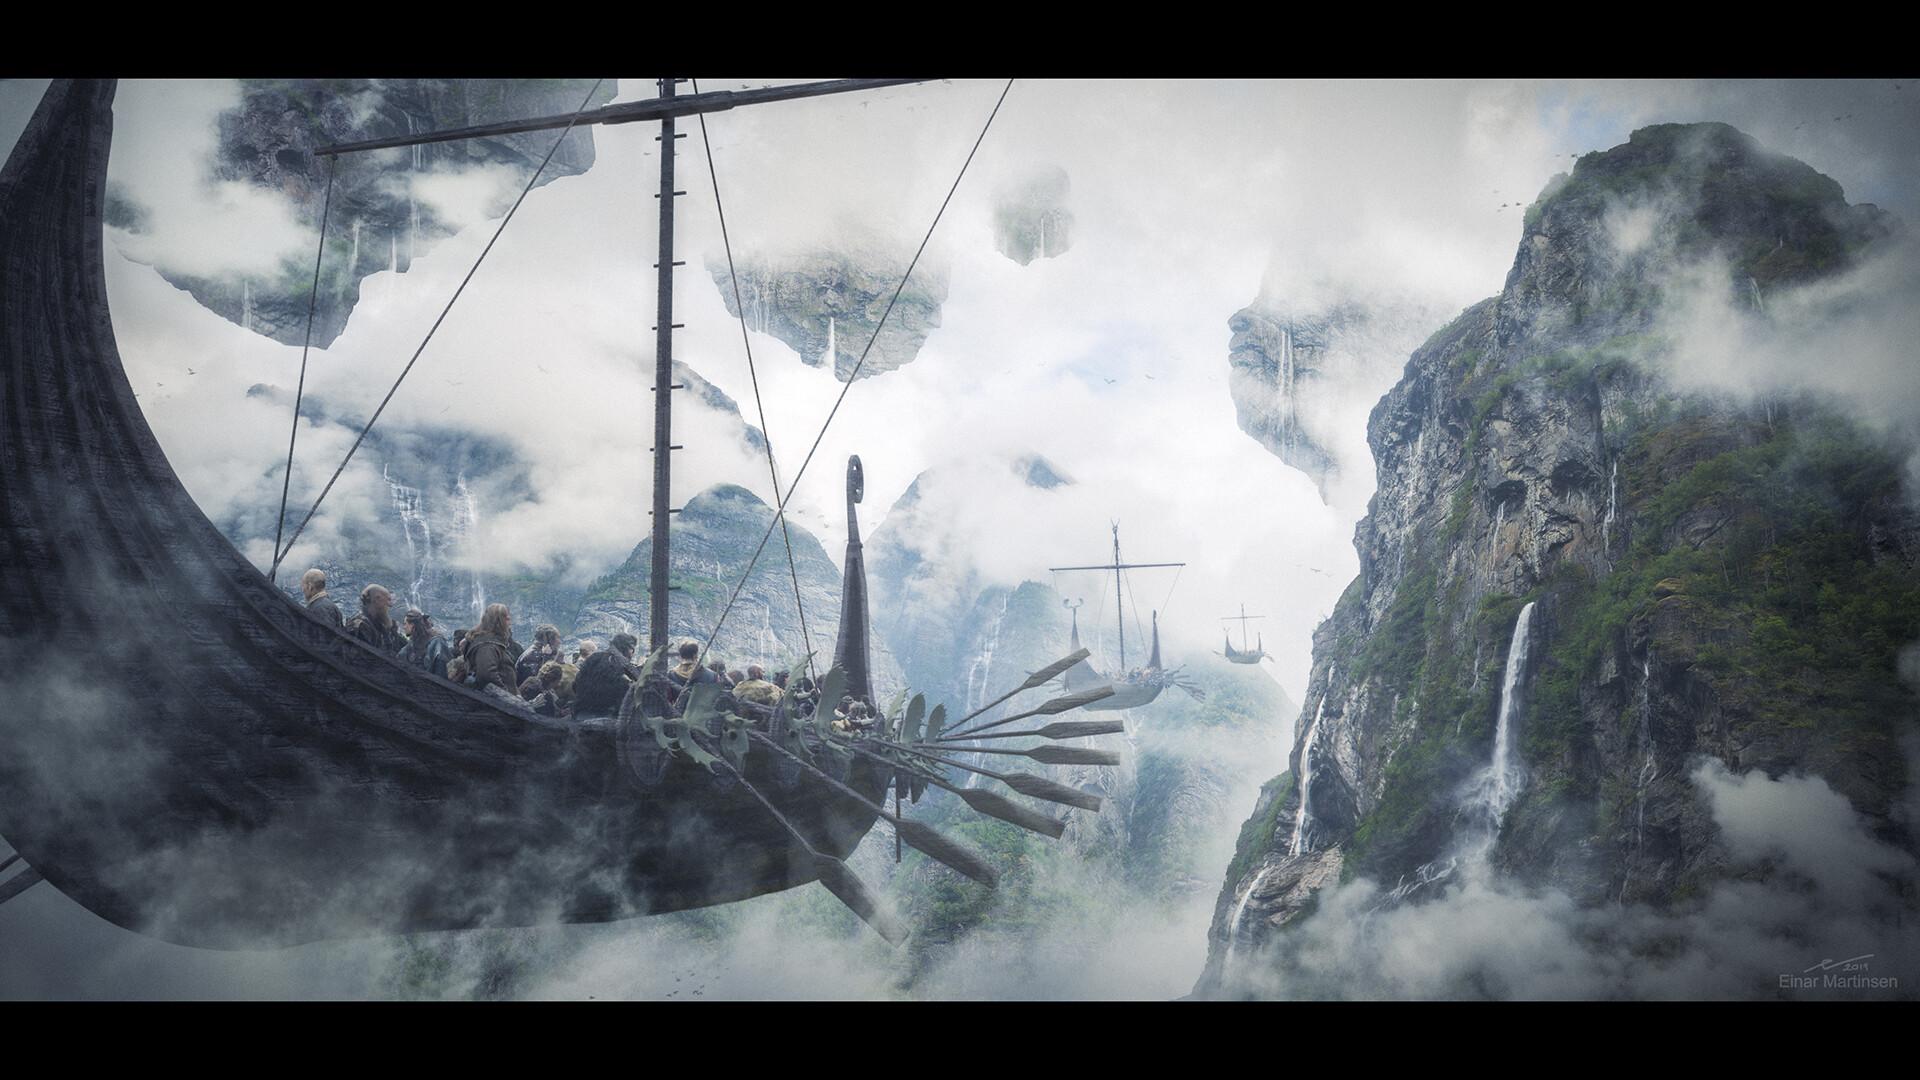 Einar martinsen viking trollpass em hd 01